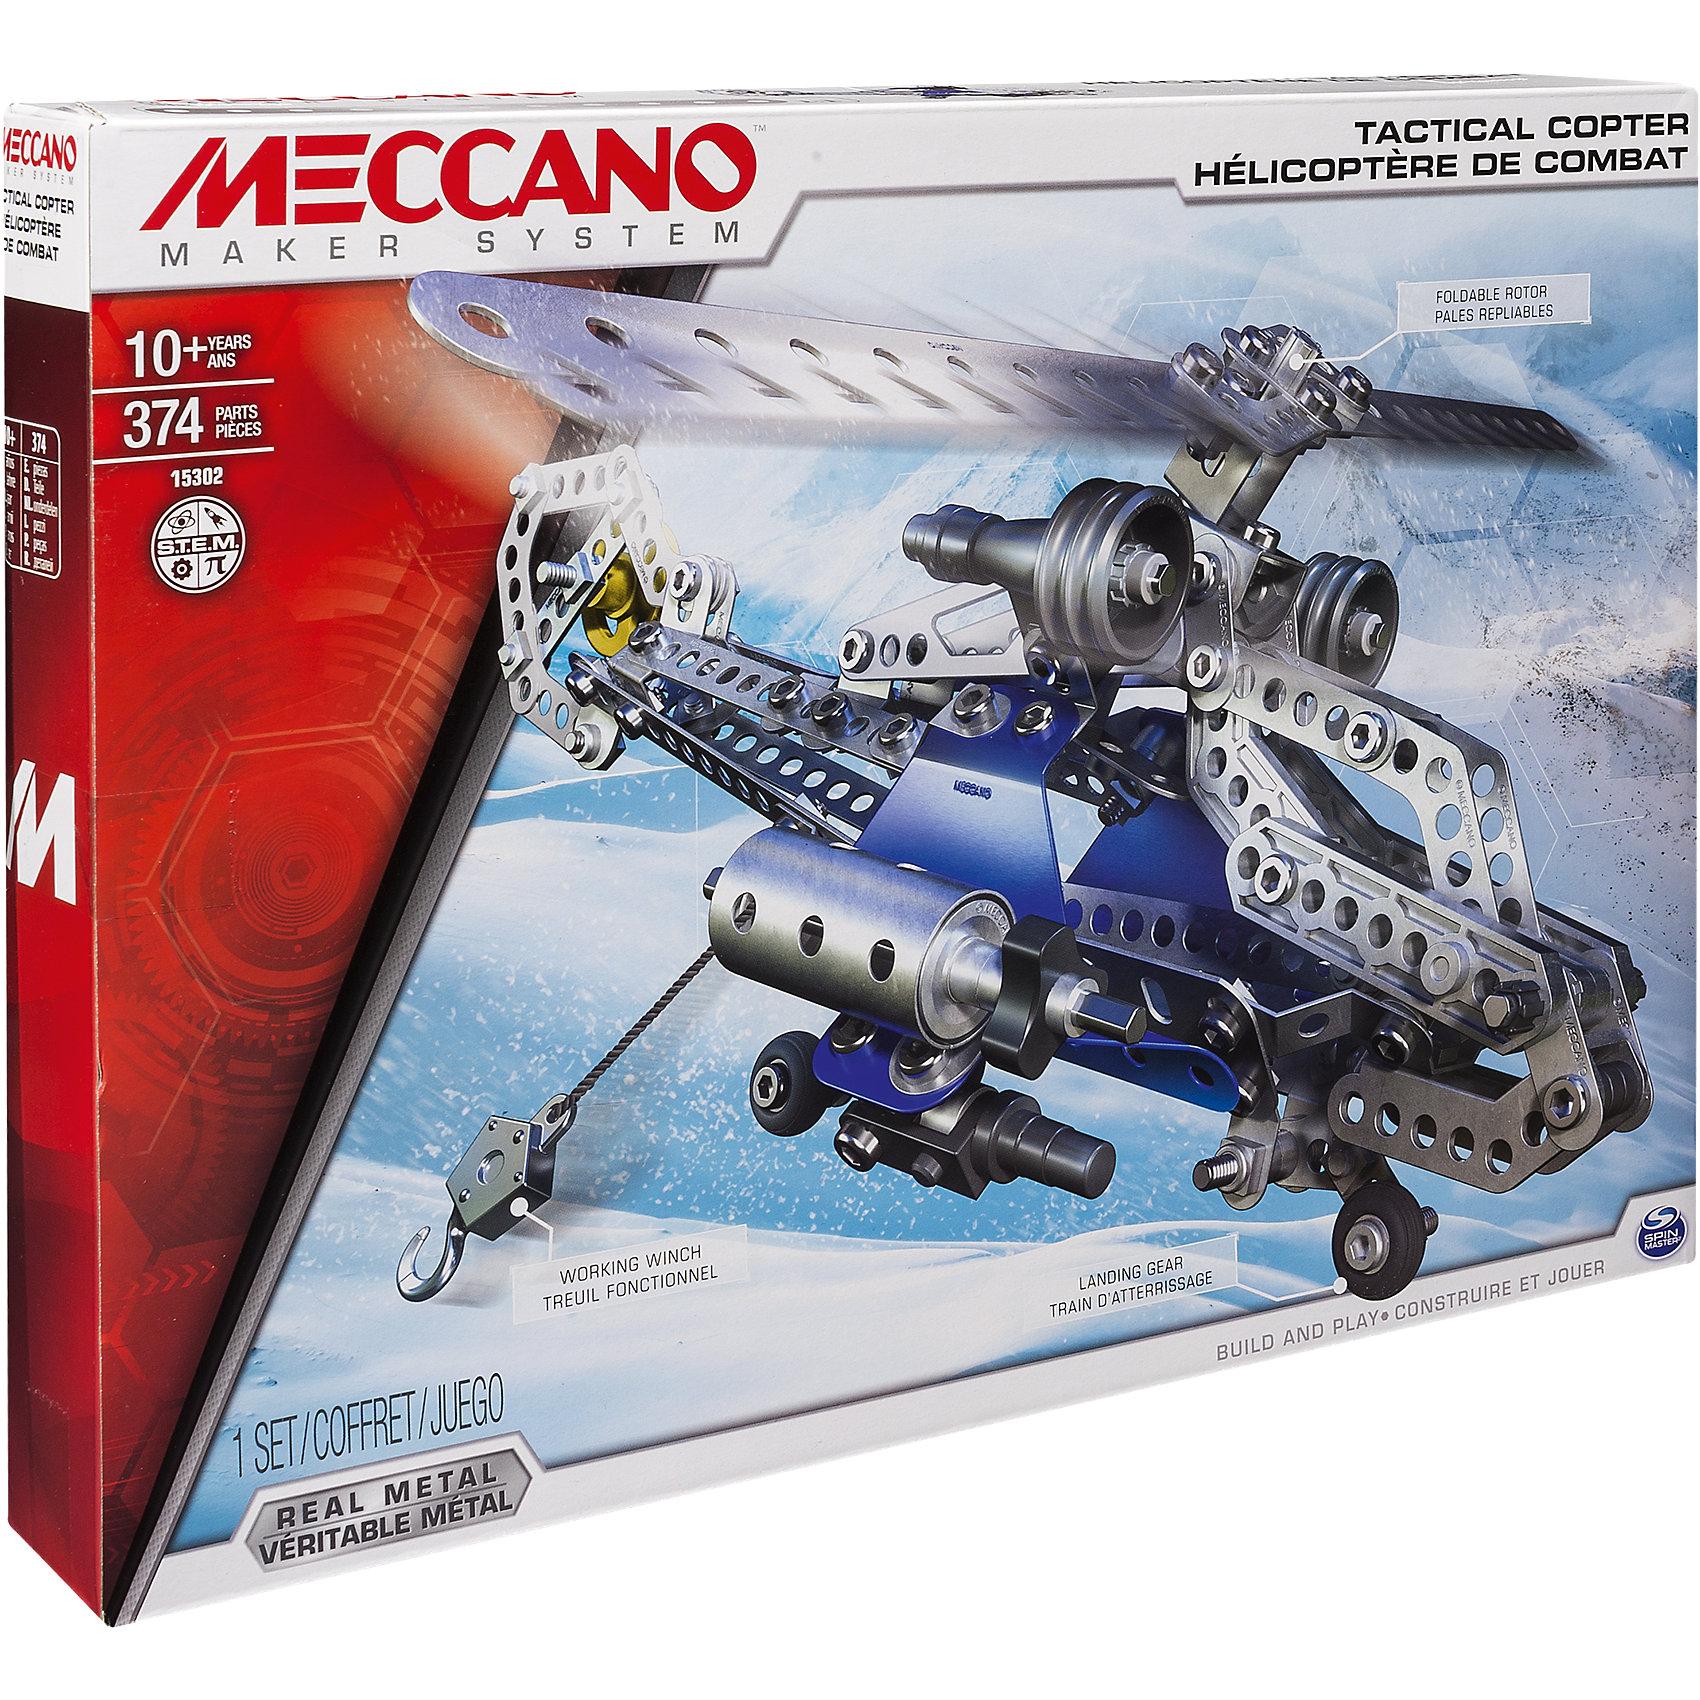 Meccano Боевой вертолёт (2 модели), Meccano игрушка meccano боевой вертолёт 2 модели meccano